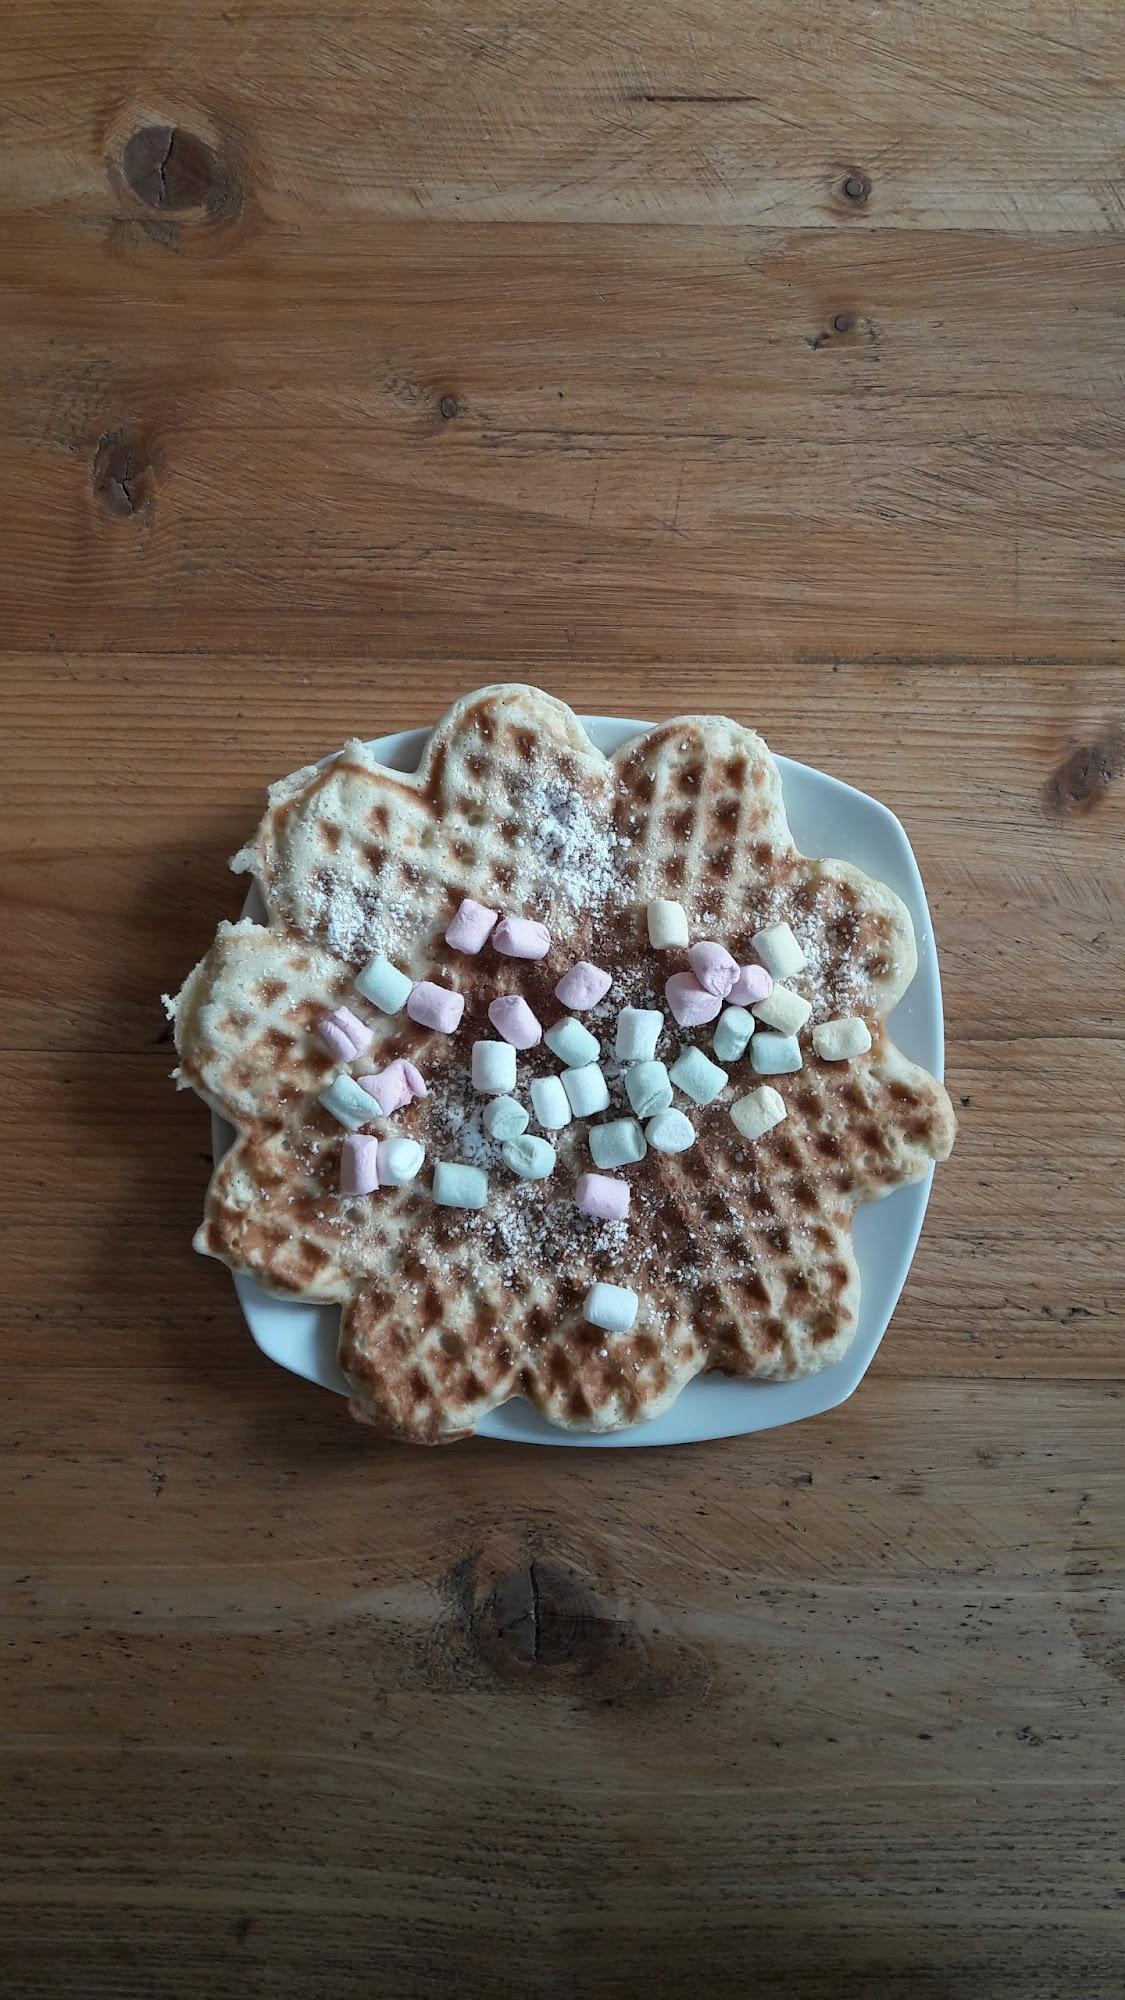 Waffeln mit Marshmallows - http://mammilade.blogspot.de - 5 Lieblinge der Woche